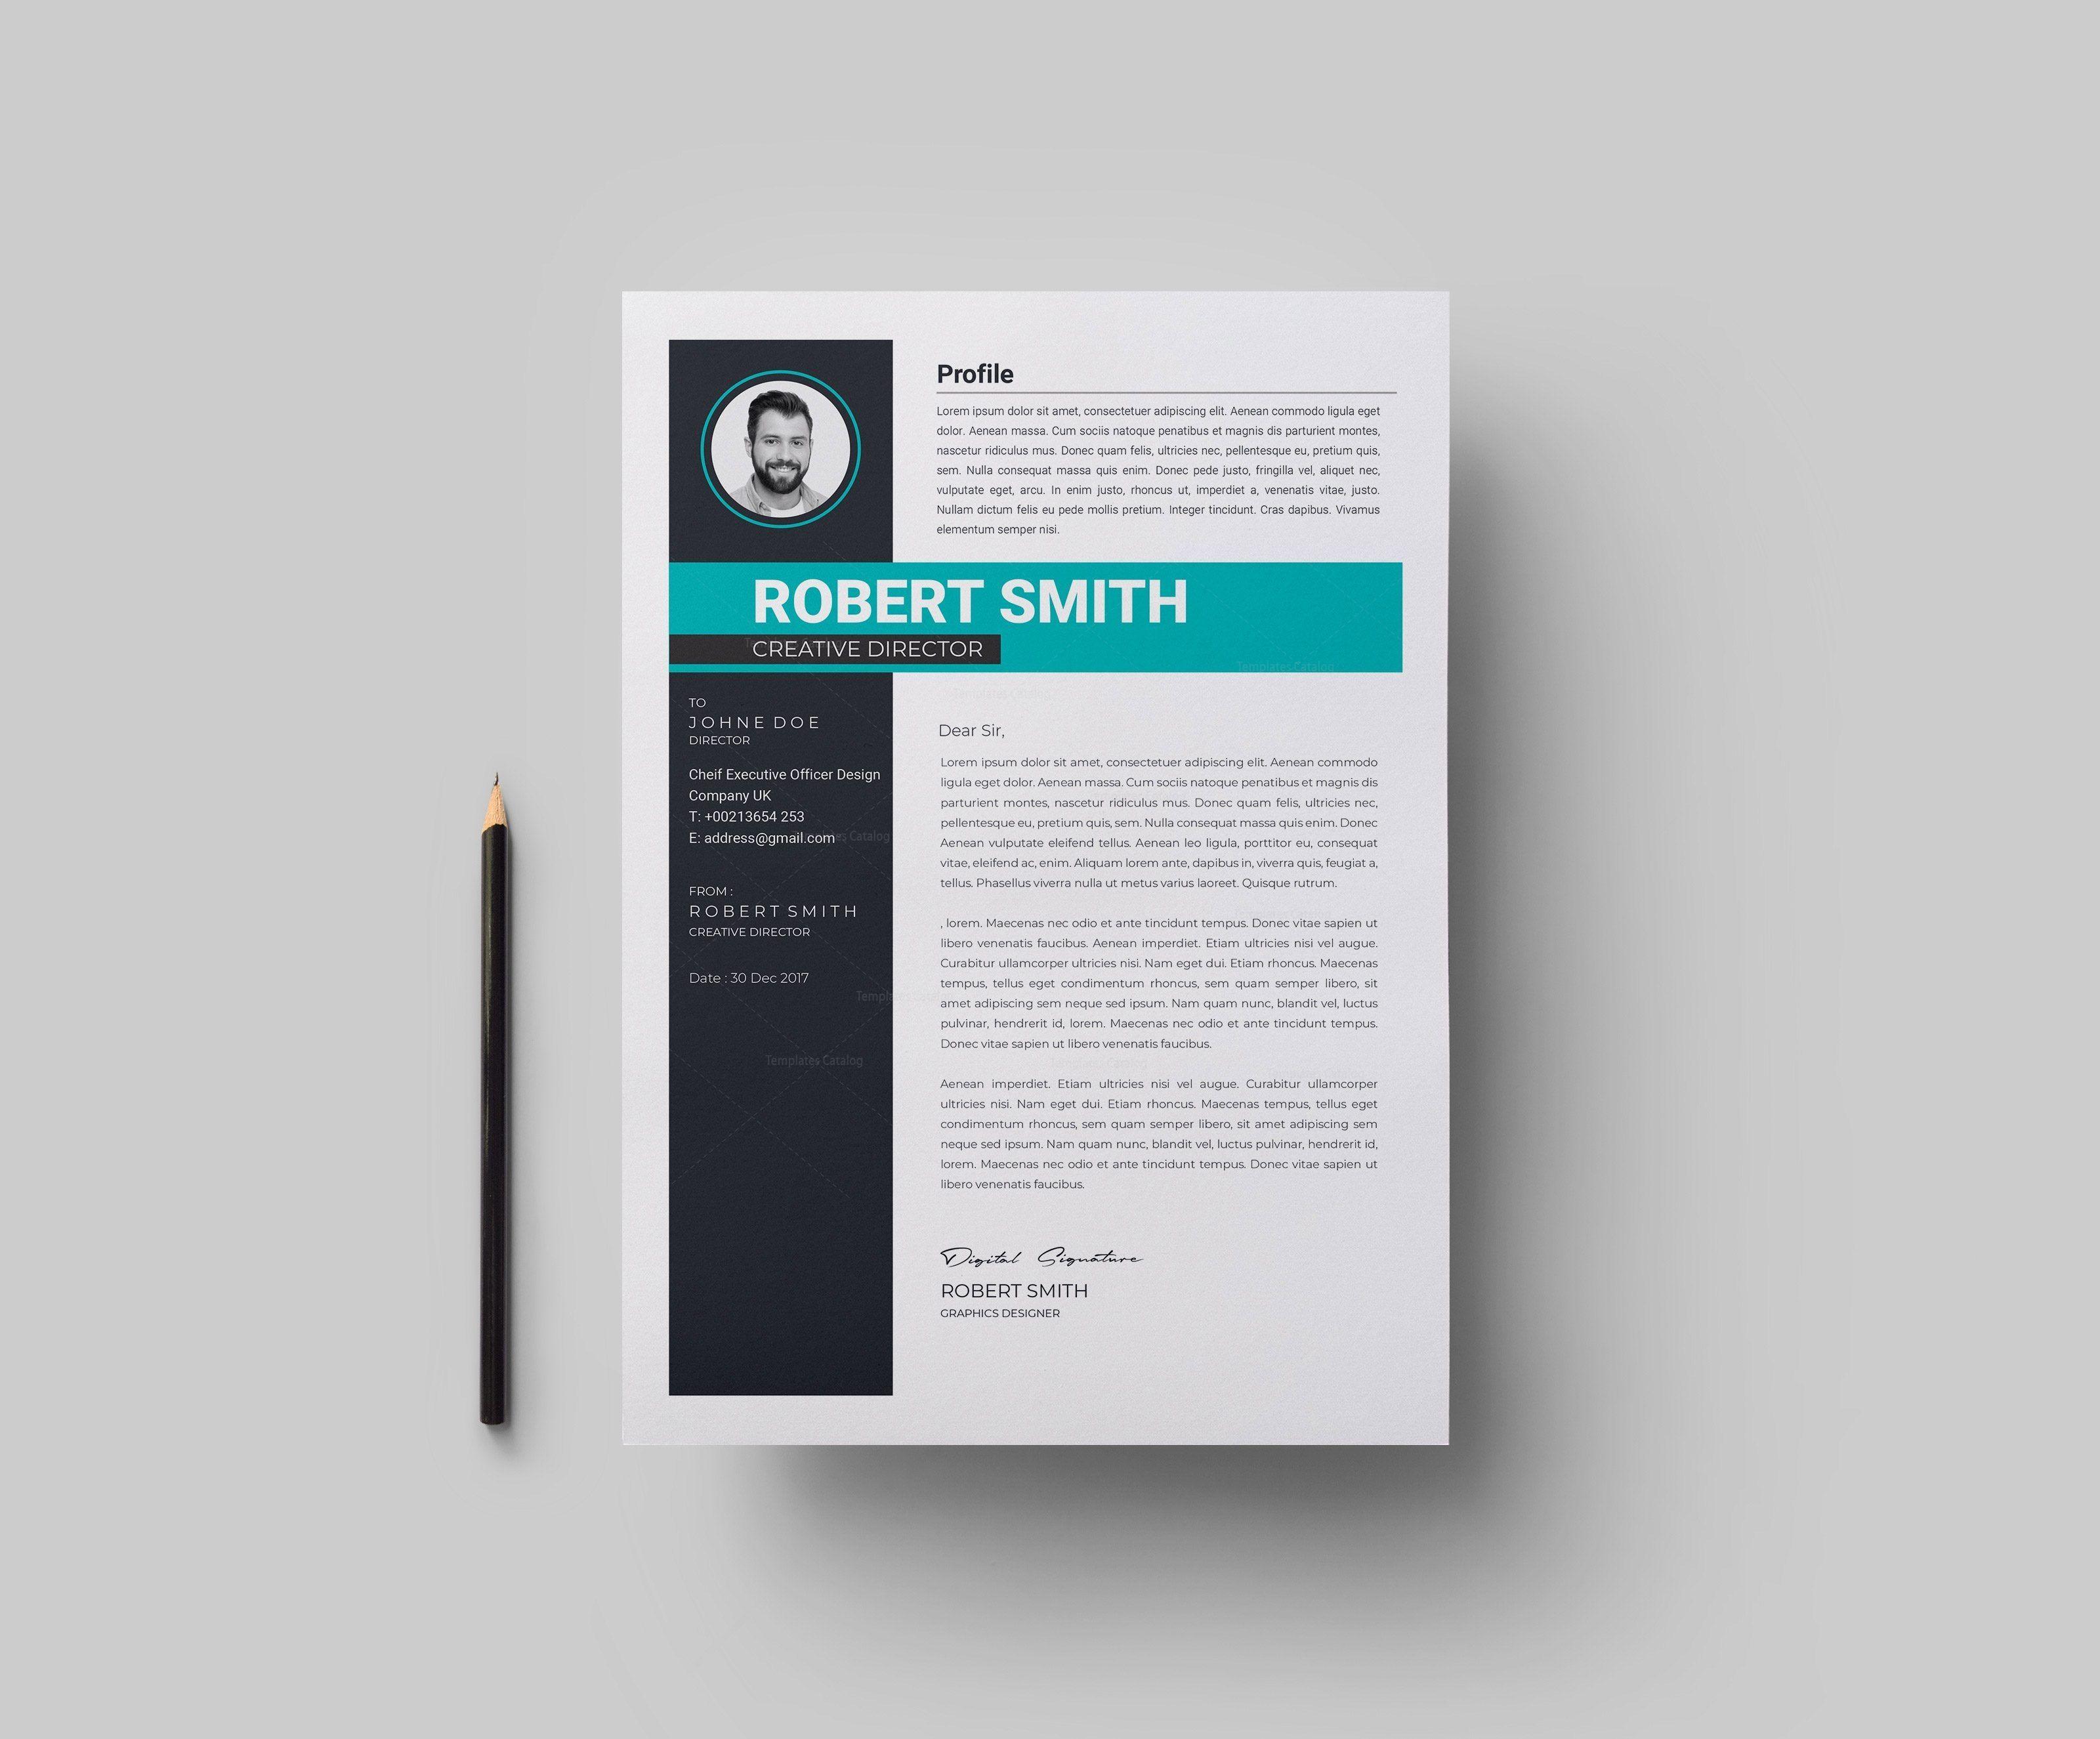 Resume Template Resume Design Template Resume Templates Curriculum Vitae Template Resume Design Template Resume Template Business Resume Template